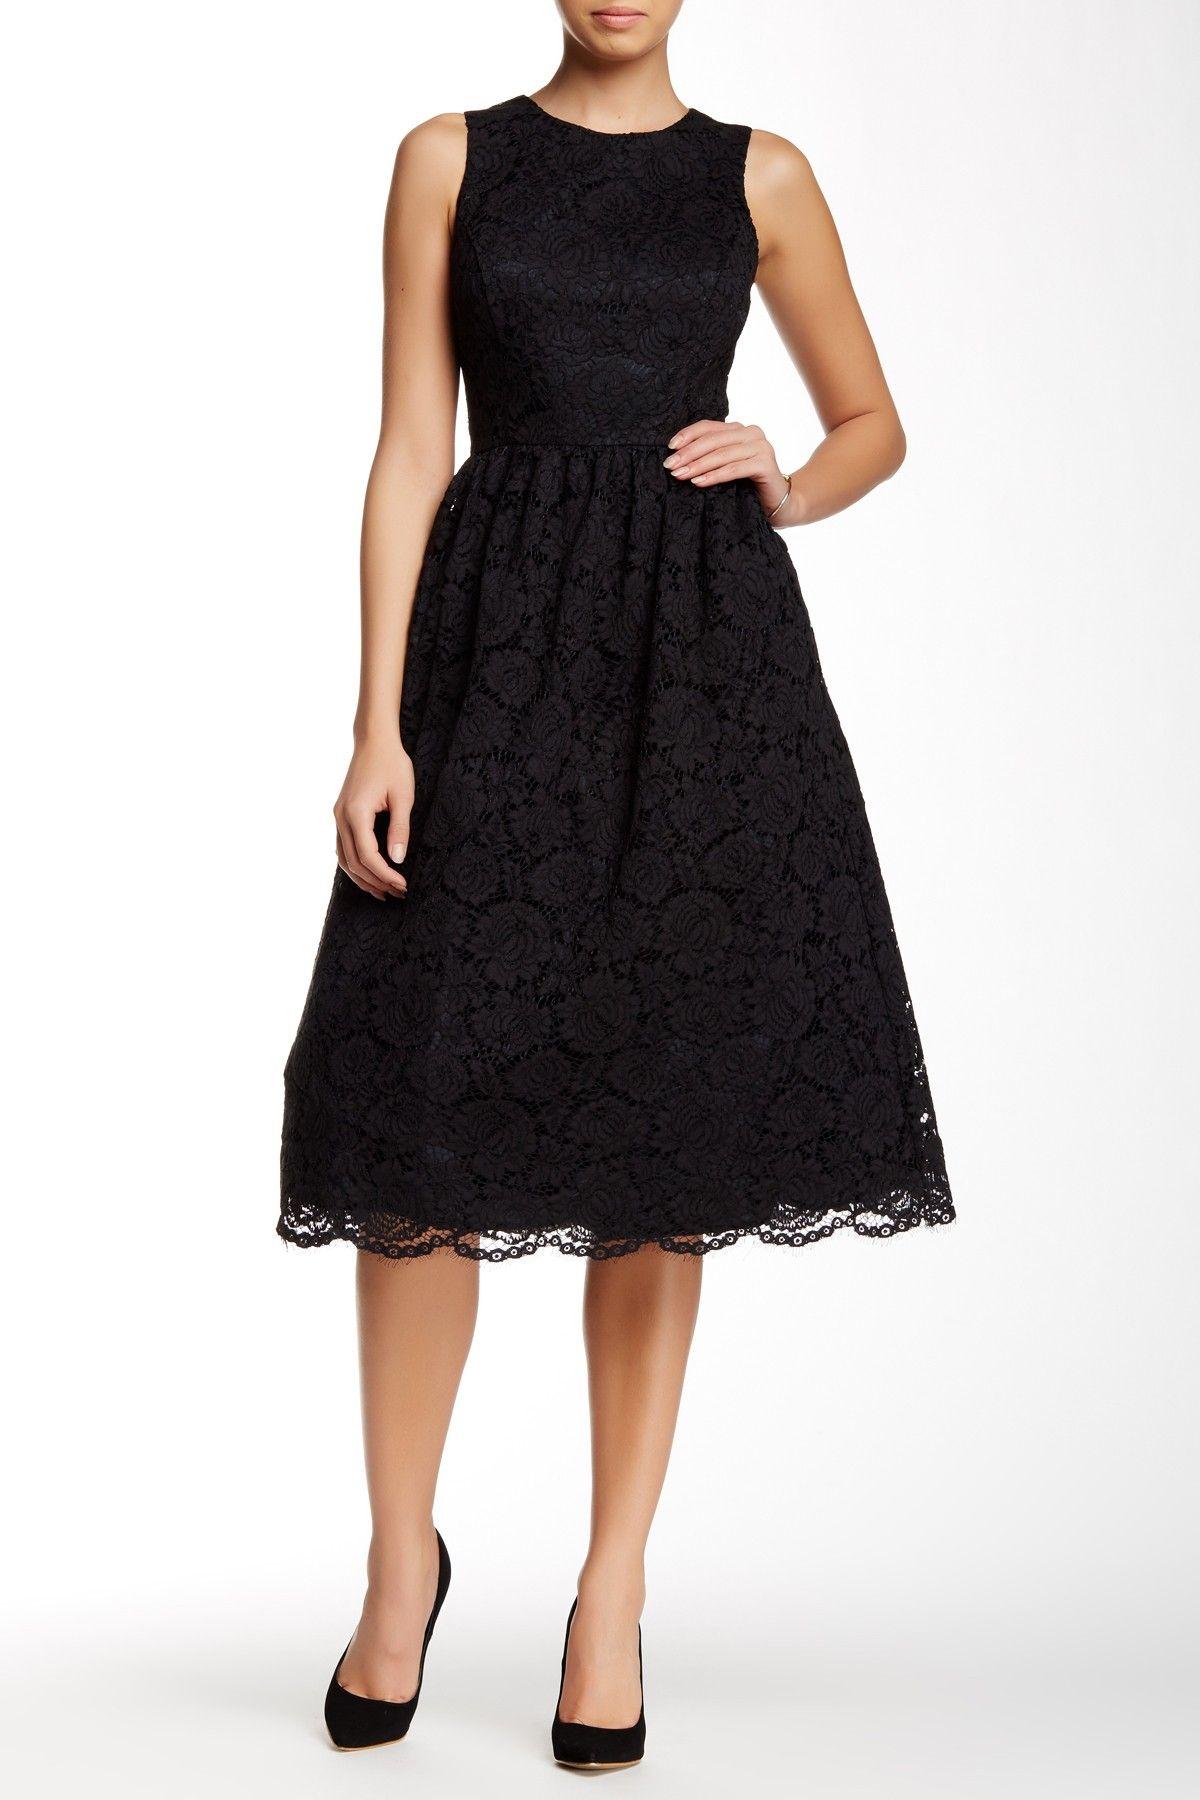 165ec71e4ffe Black Lace Dress ~ Nordstrom Rack Sponsored Sponsored by Nordstrom Rack.